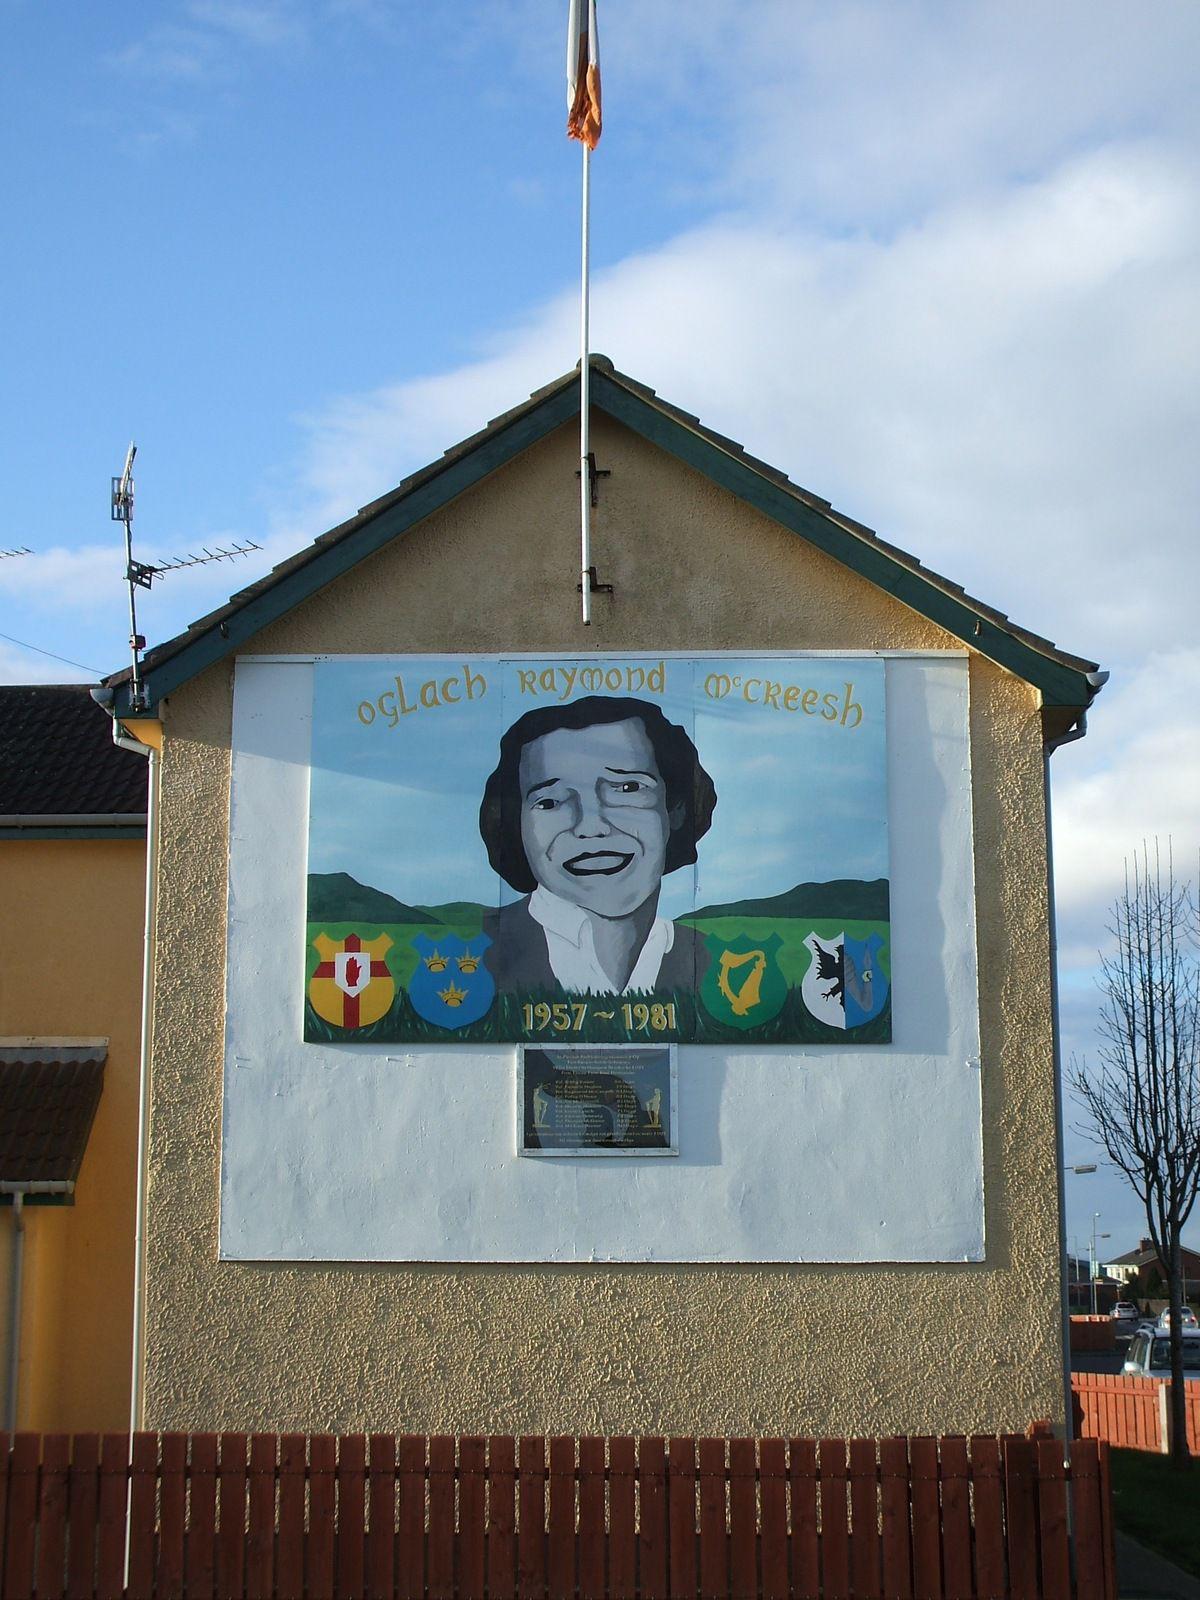 843) Lurgan Républicain